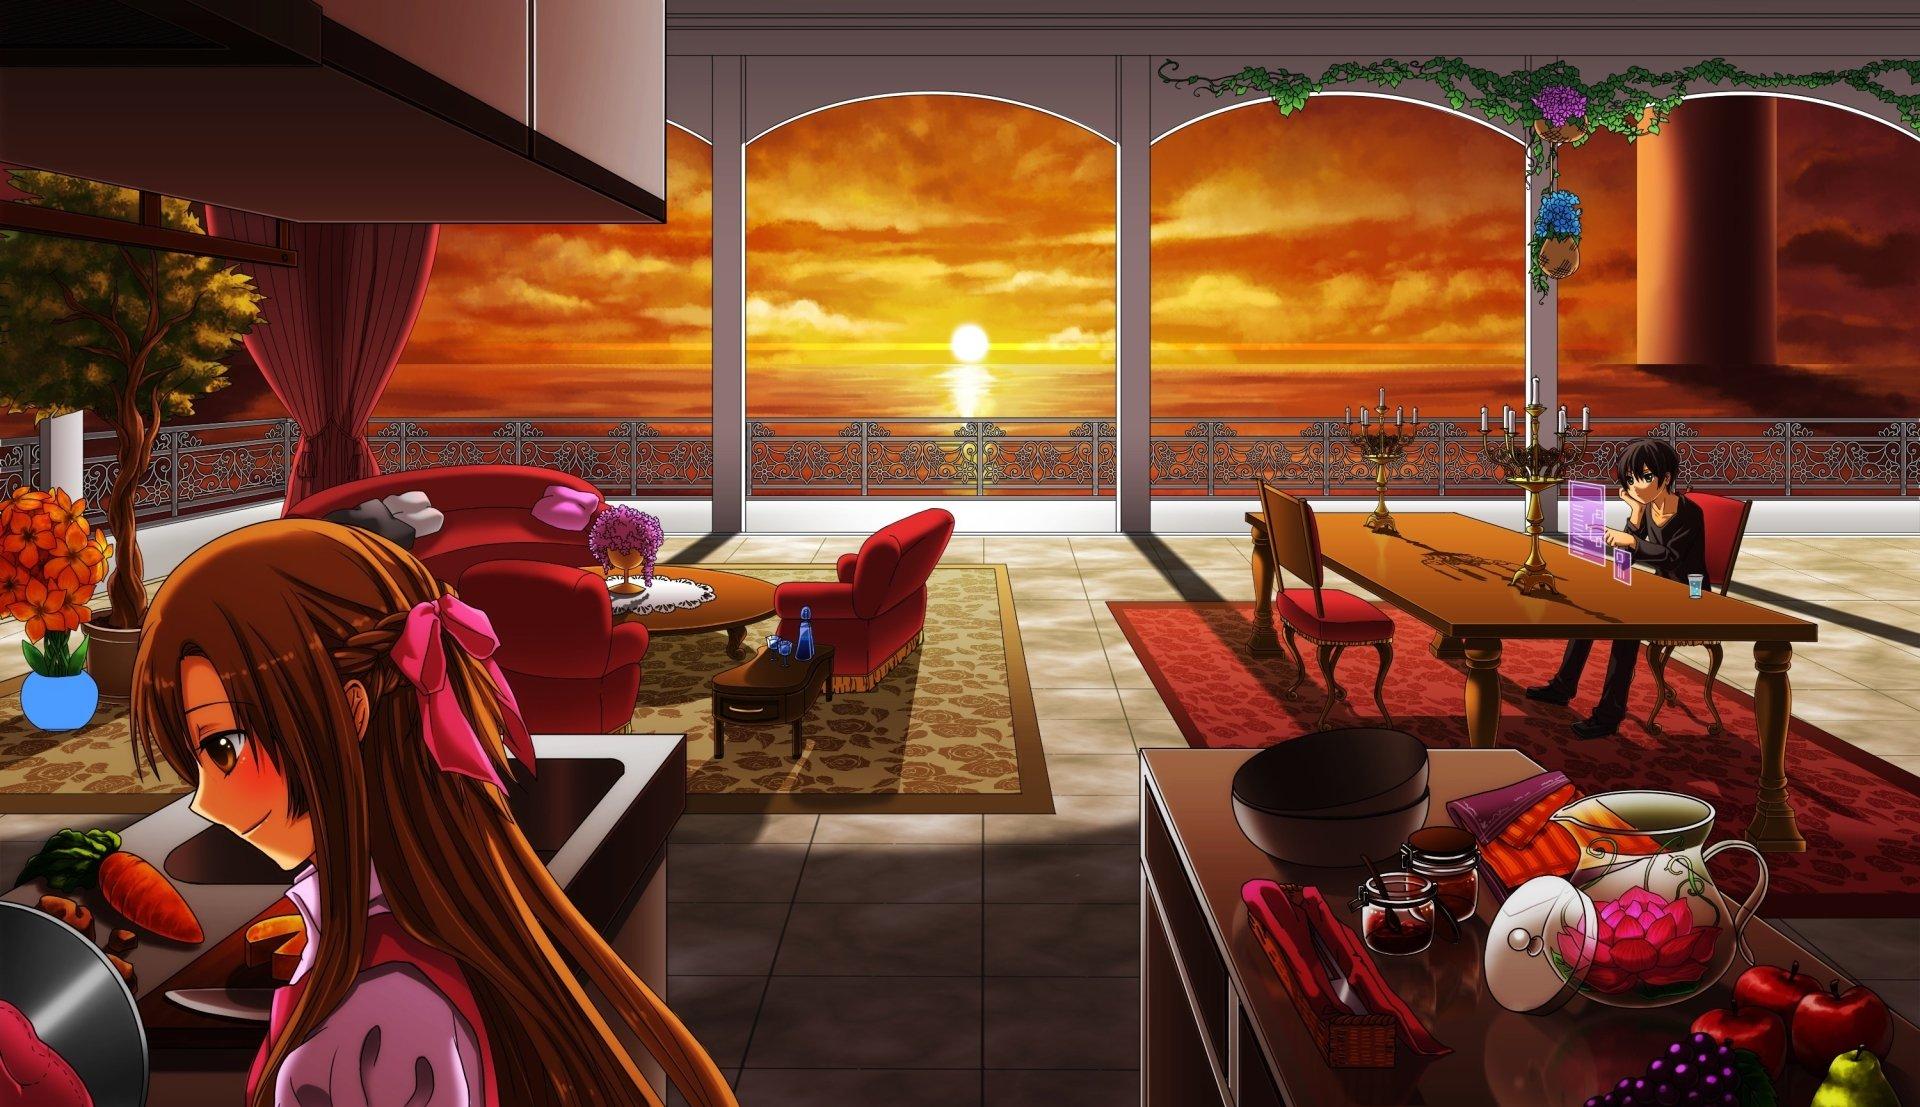 Anime - Sword Art Online  Asuna Yuuki Kirito (Sword Art Online) Girl Boy Terrace Sunset Sea Wallpaper